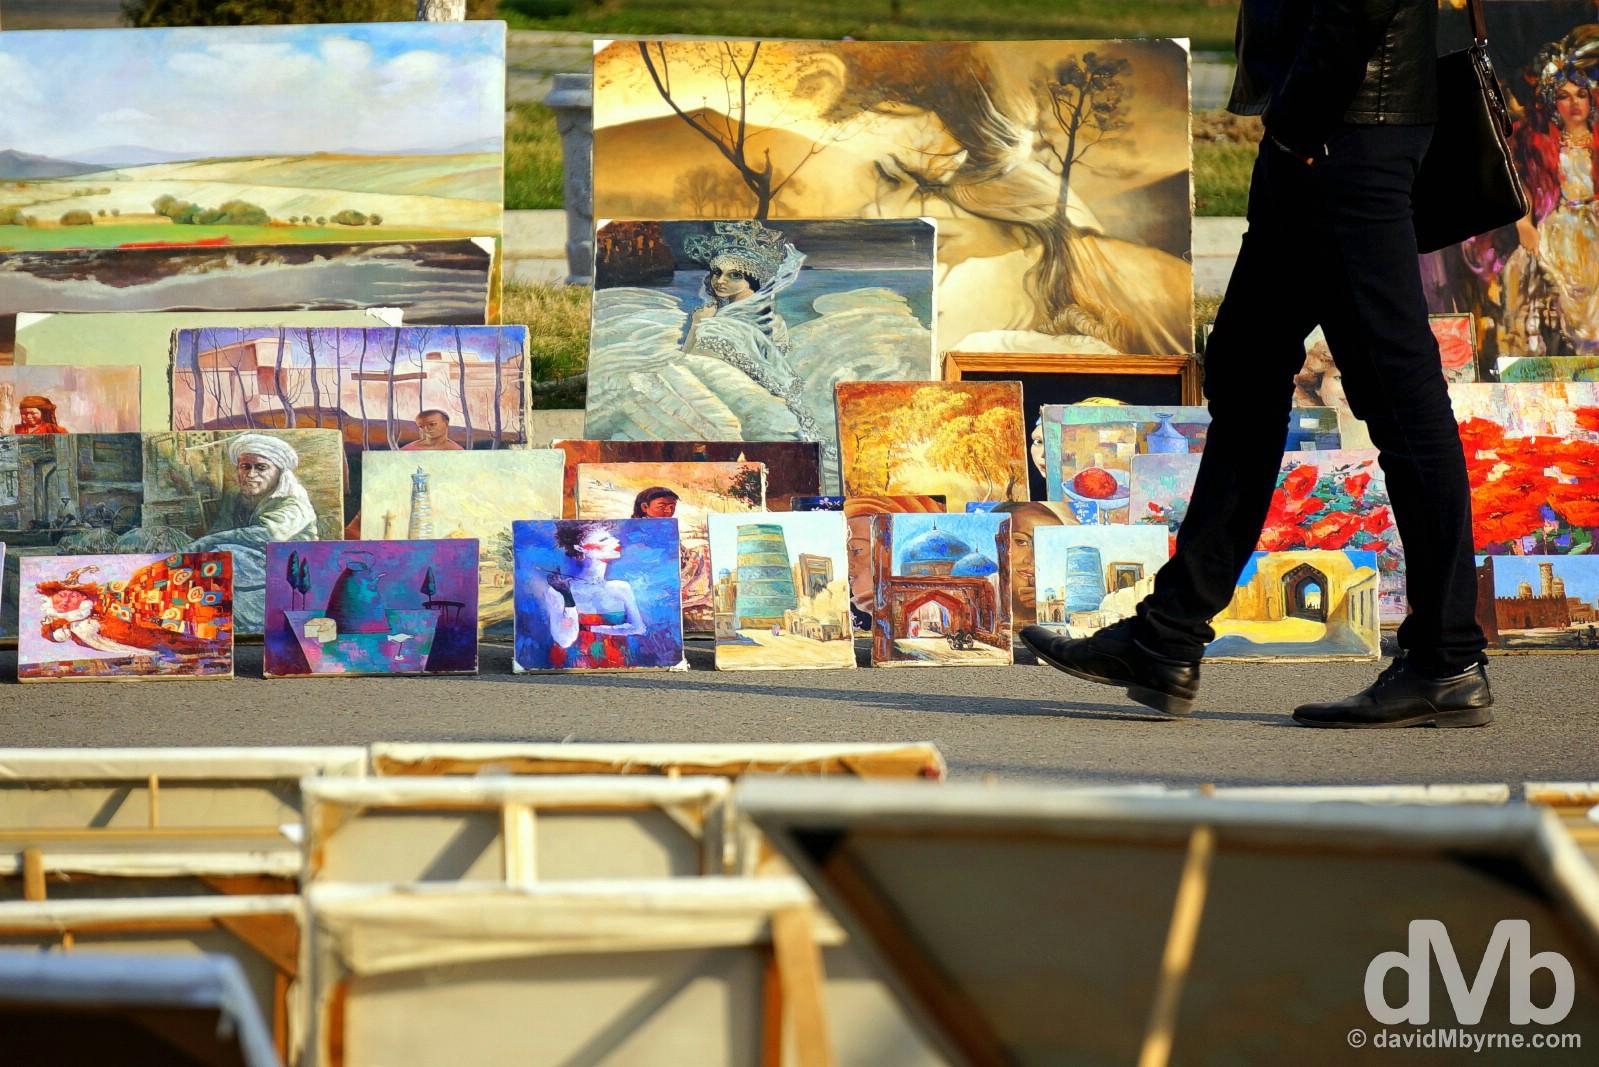 Art for sale on Sayilgoh (Broadway) in central Tashkent, Uzbekistan. March 5, 2015.